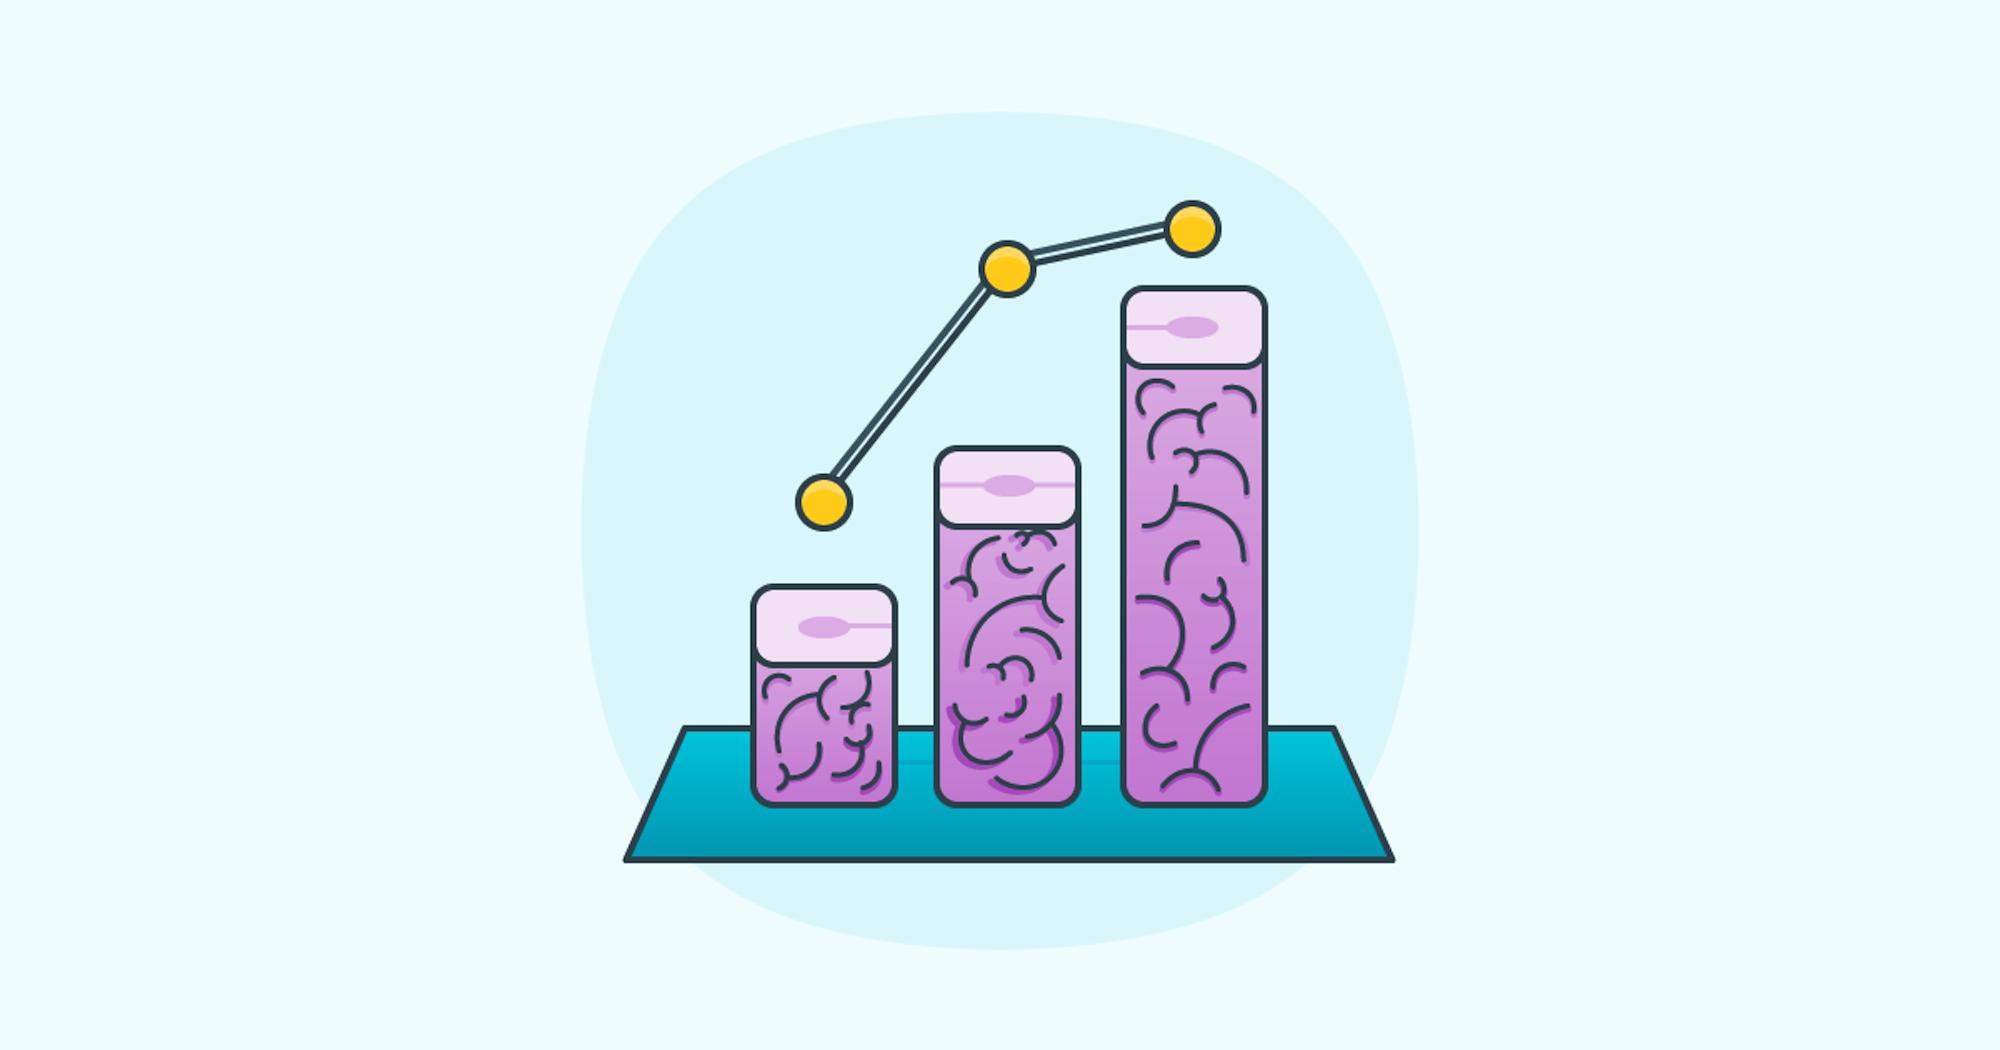 Business Intelligence Daten als Säulendiagramm